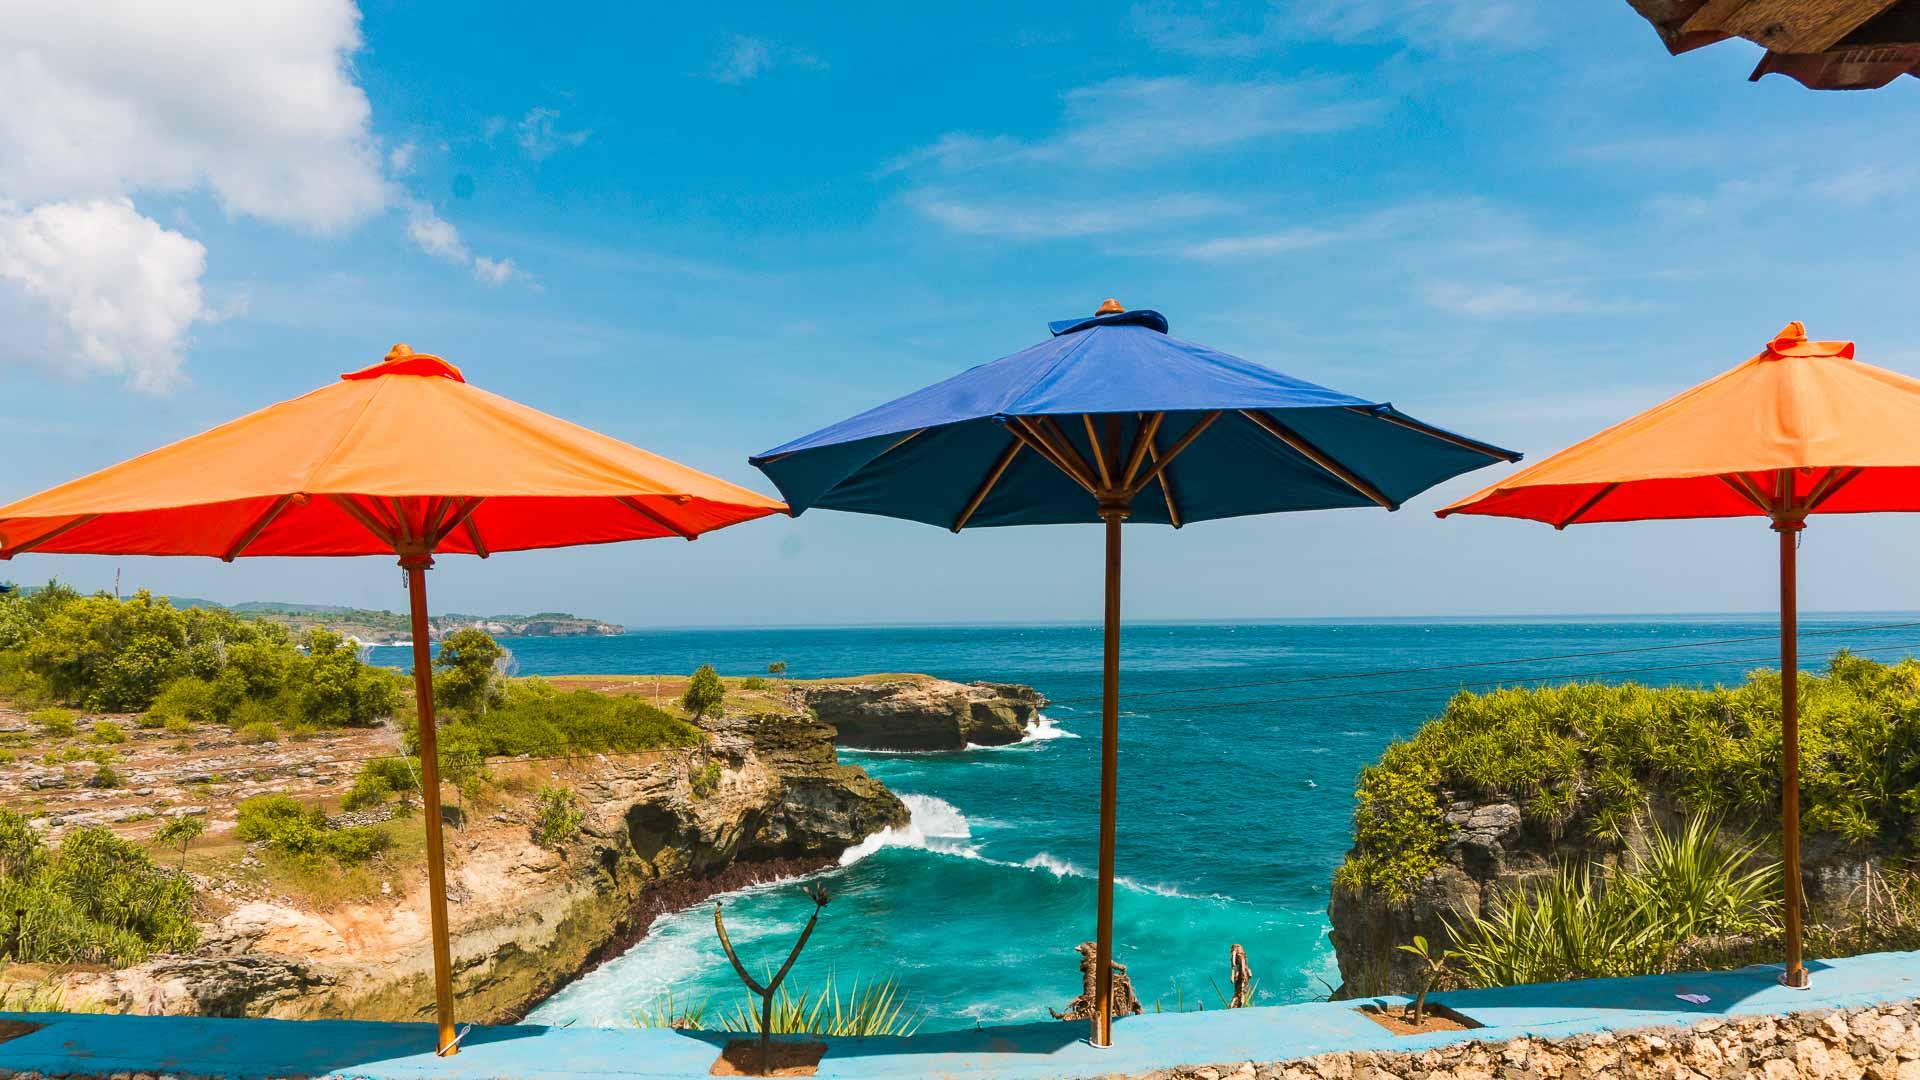 Nusa Lembongan and Nusa Ceningan | Bali's little brother and sister